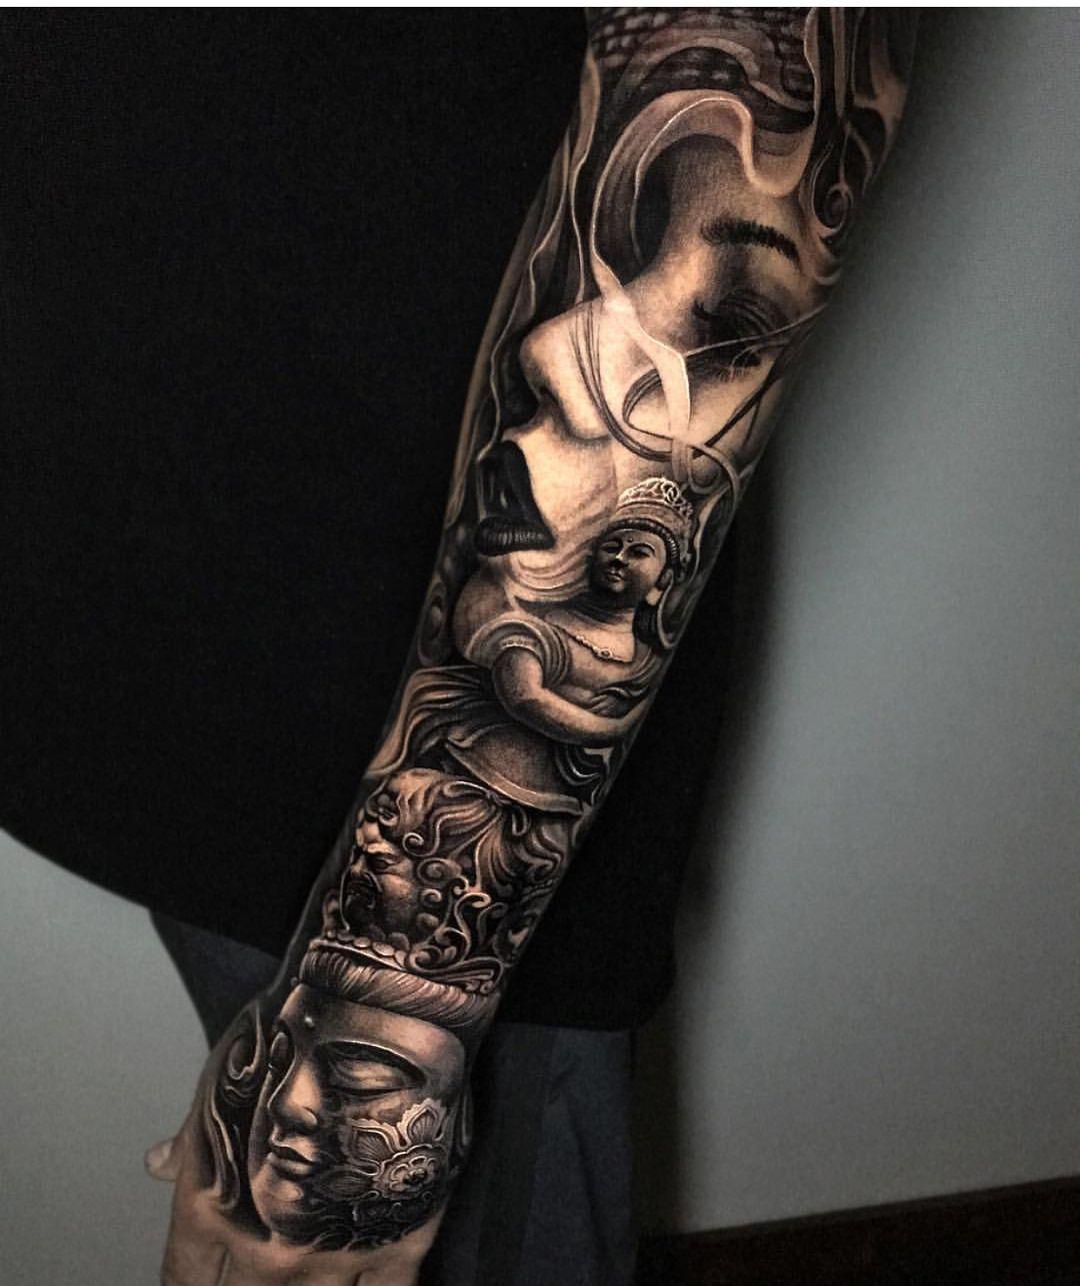 B G Tattoo Artwork Artist I Tattoos For Guys Forearm Tattoo Men Cool Forearm Tattoos